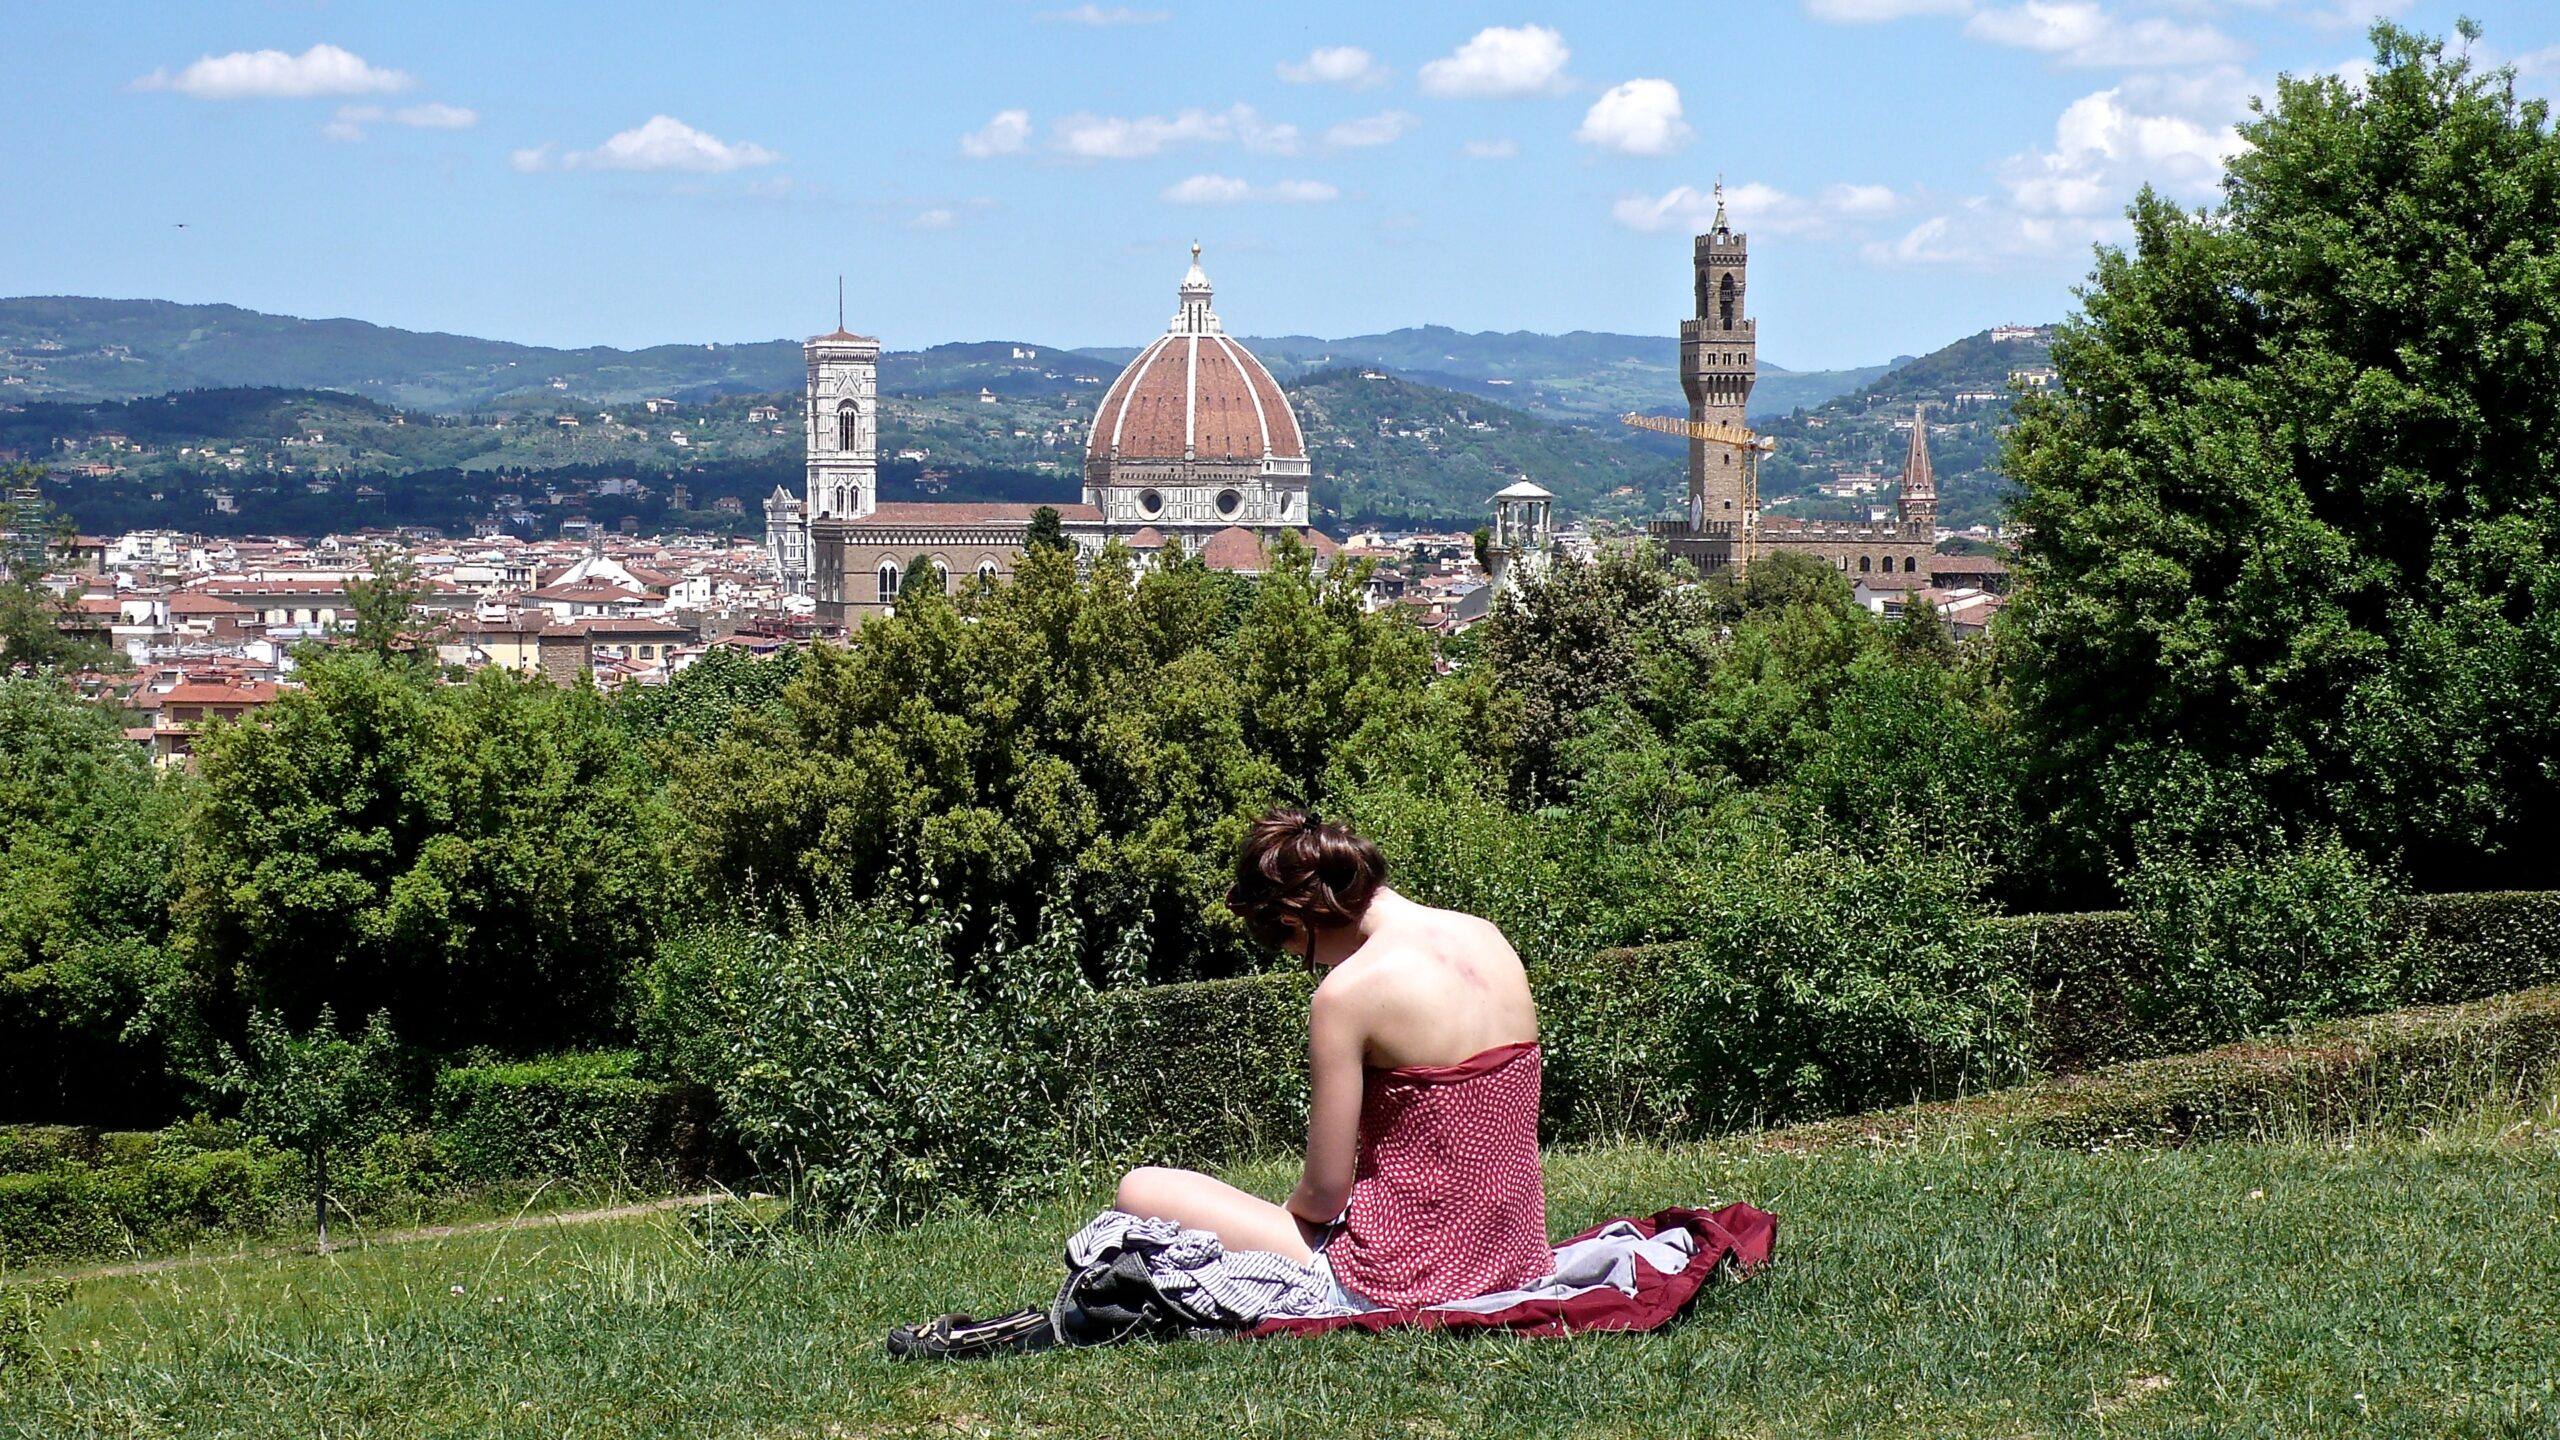 Florenz Bobopi-Garten mit lesender Frau